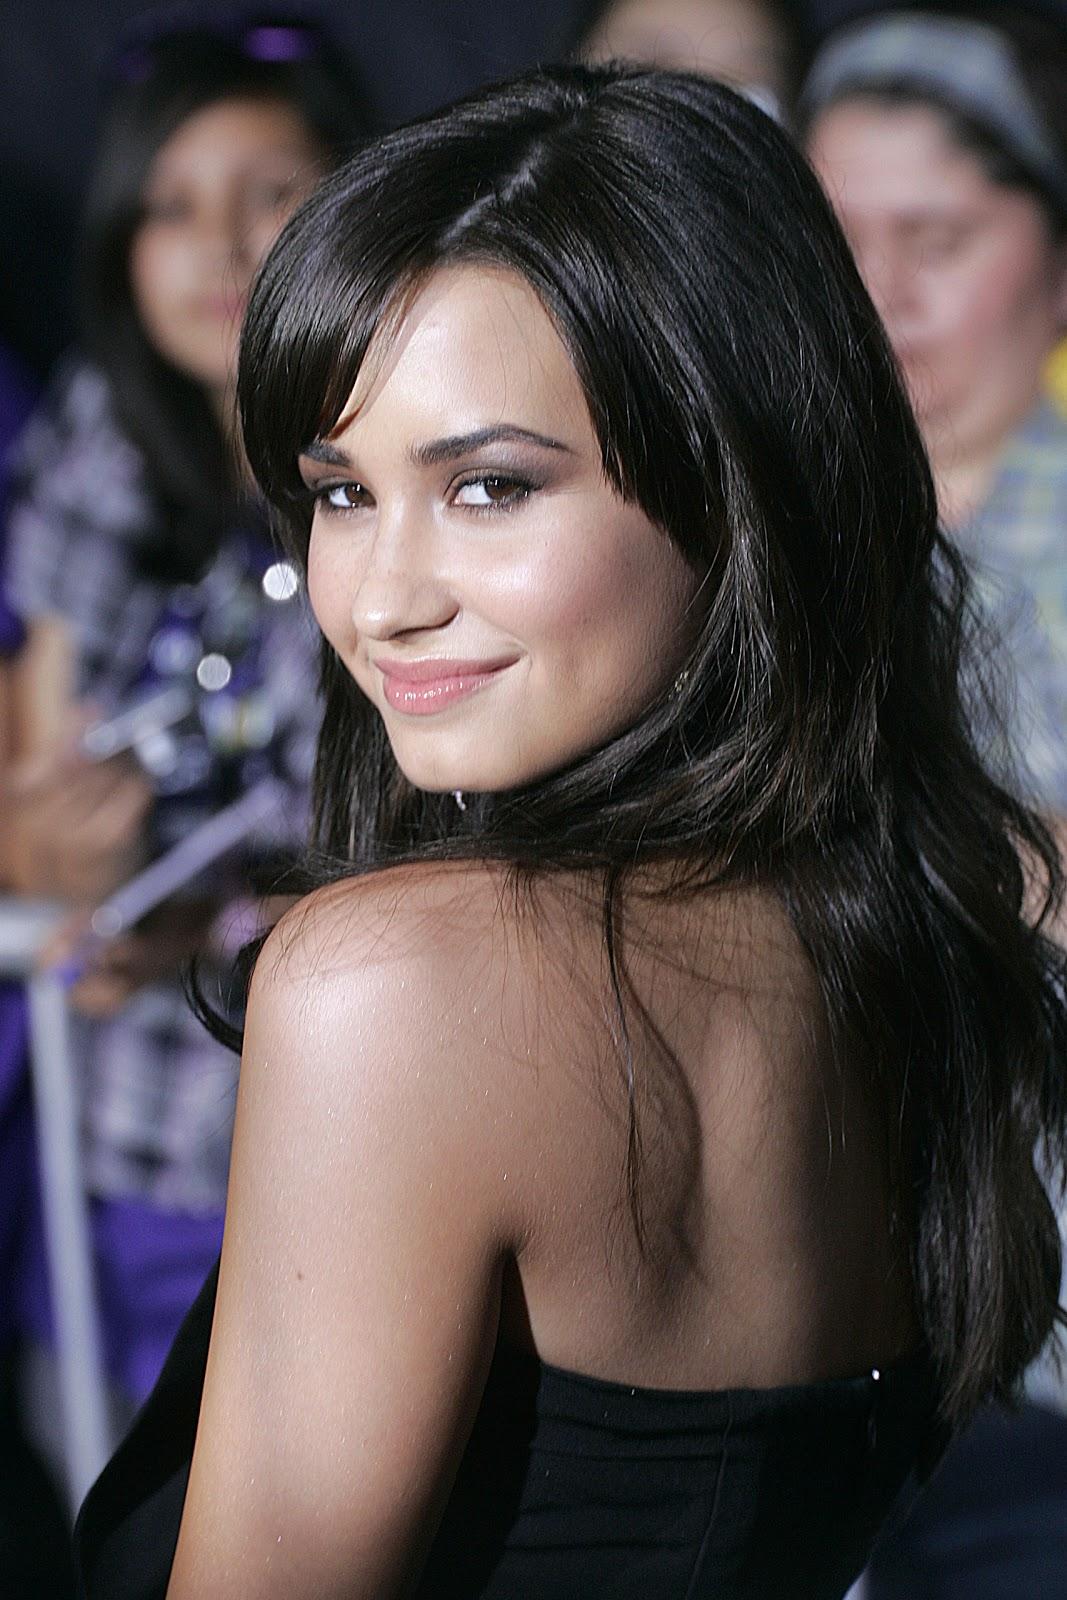 Erotica Demetria Lovato  naked (85 images), Snapchat, bra